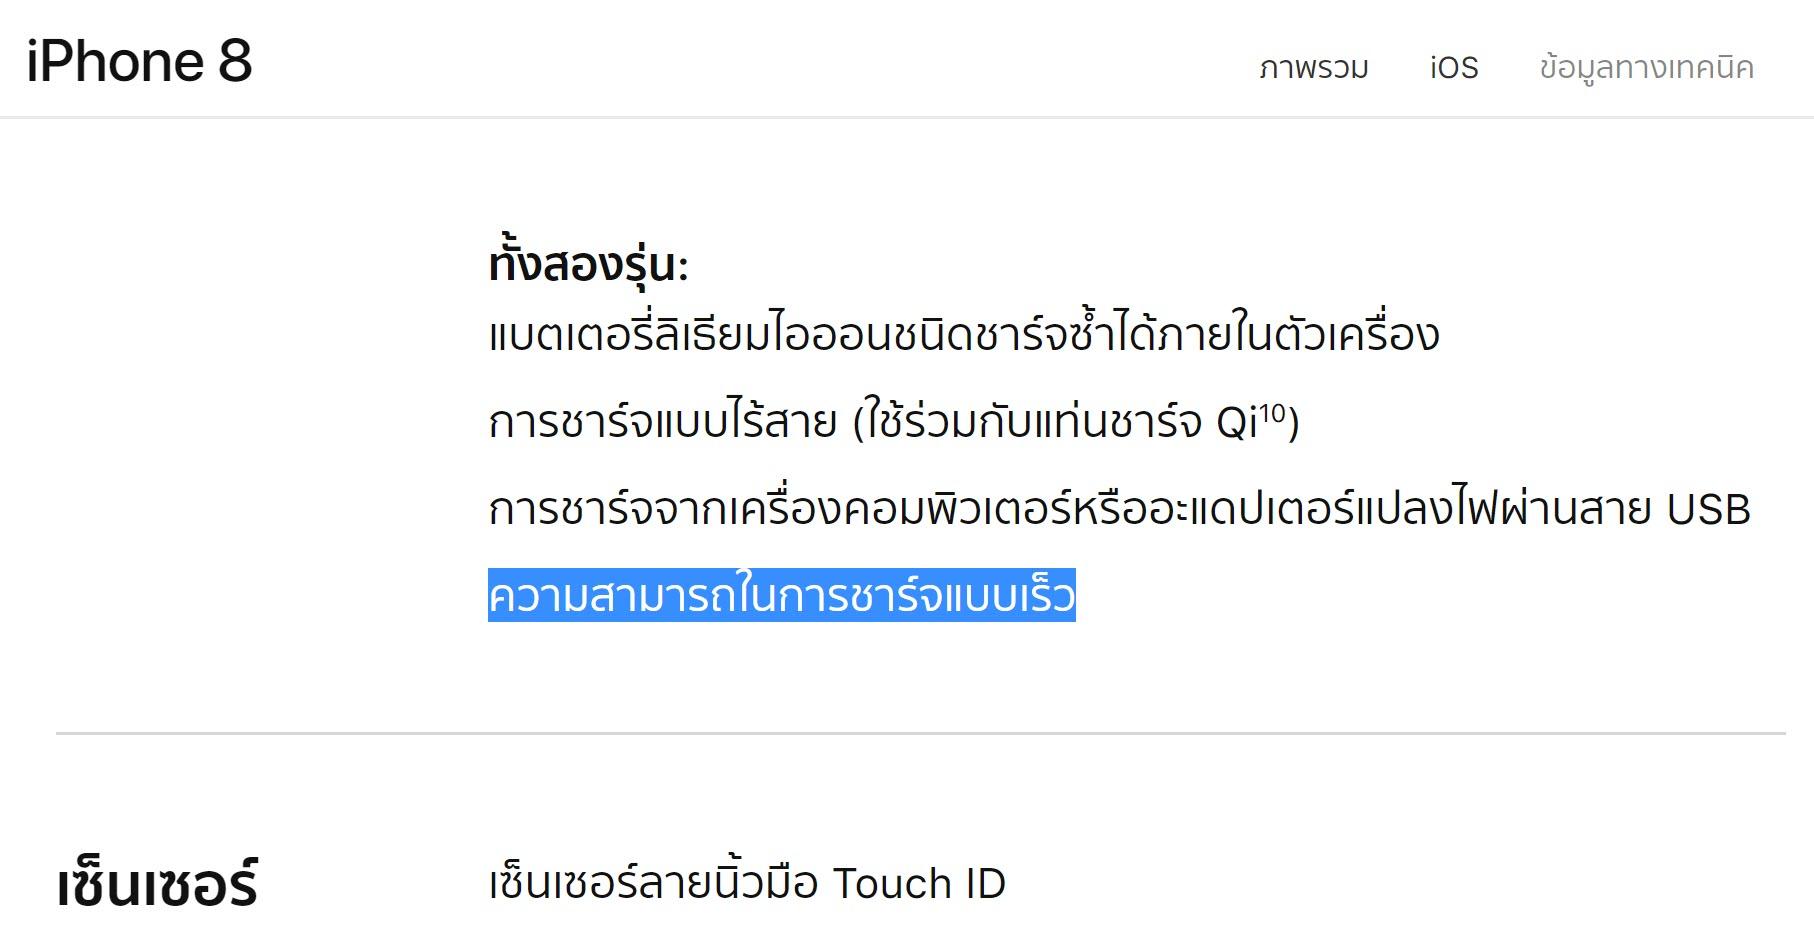 Iphone8 Iphonex Fastcharge 1